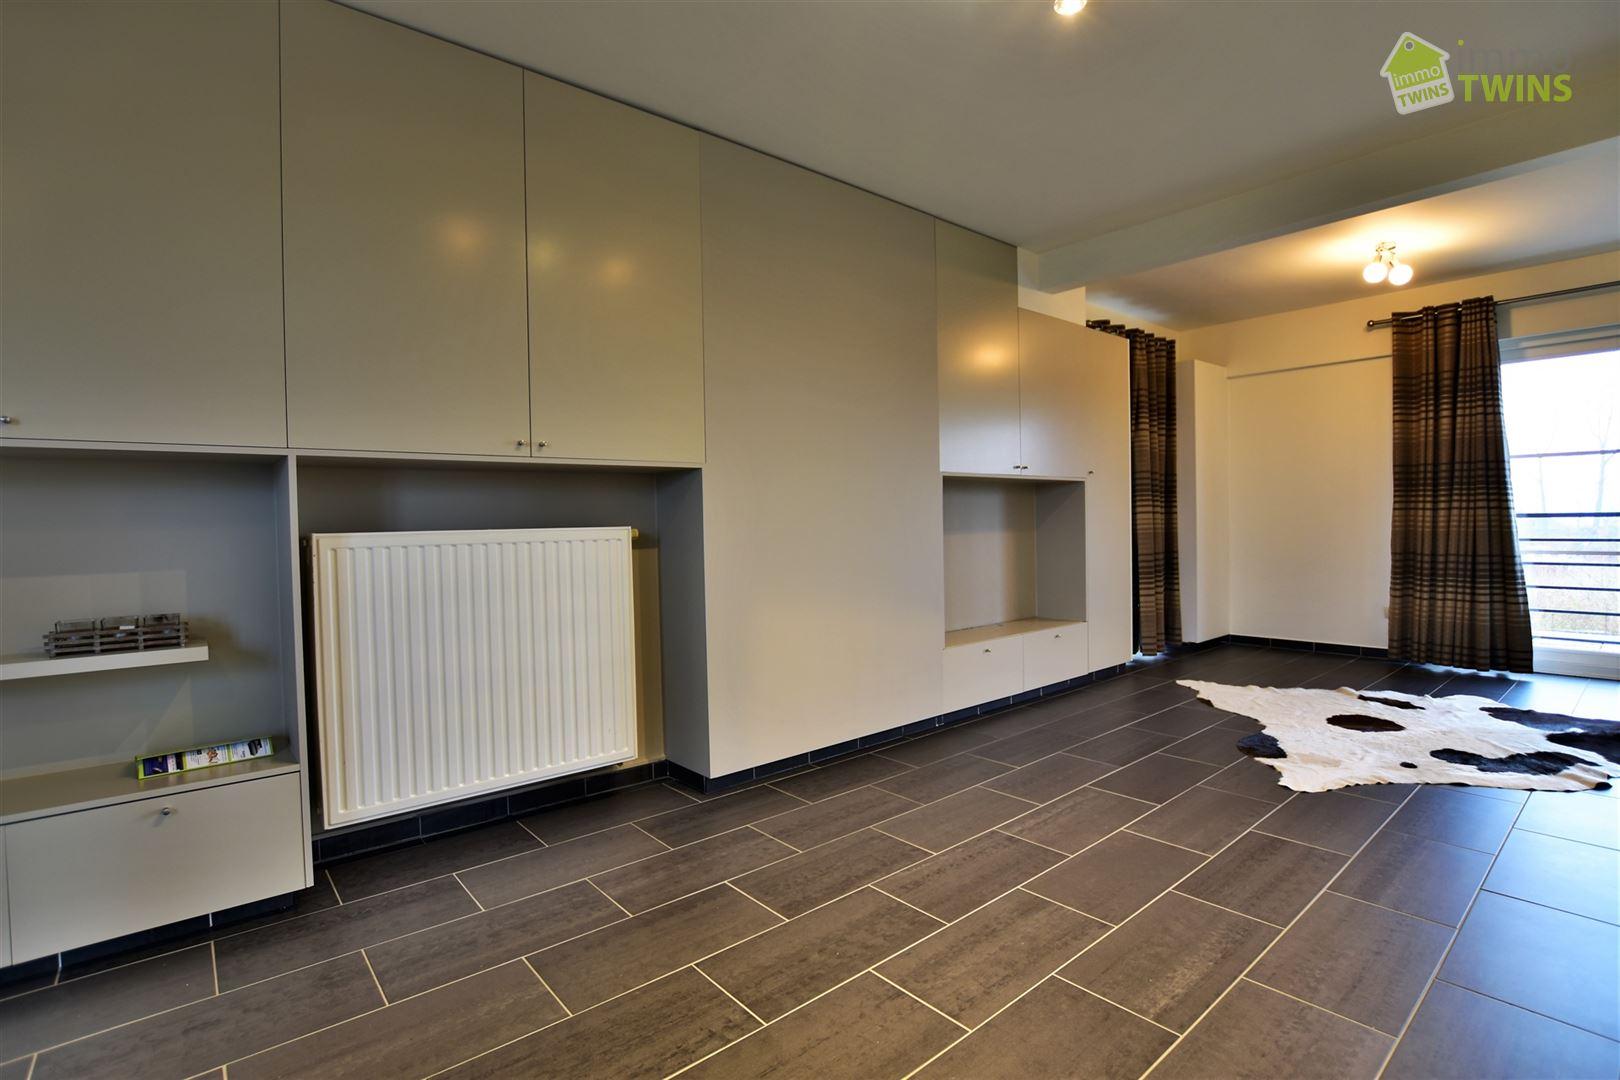 Foto 7 : Appartement te 9200 BAASRODE (België) - Prijs € 650